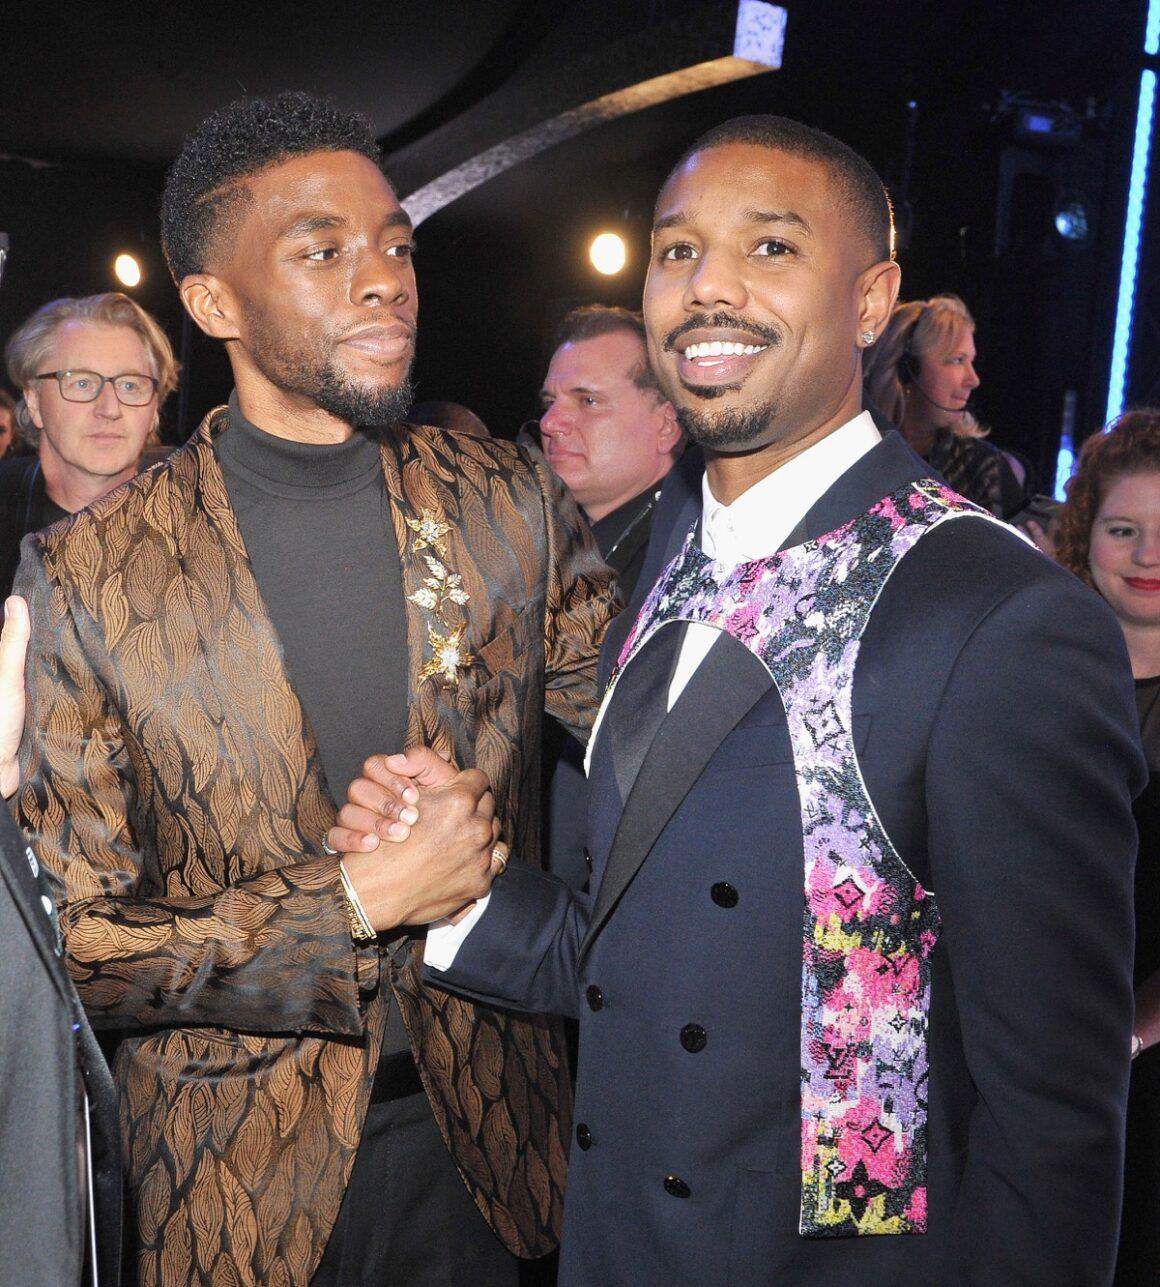 Chadwick Boseman and Michael B. Jordan 25th Annual Screen ActorsGuild Awards - Cocktails